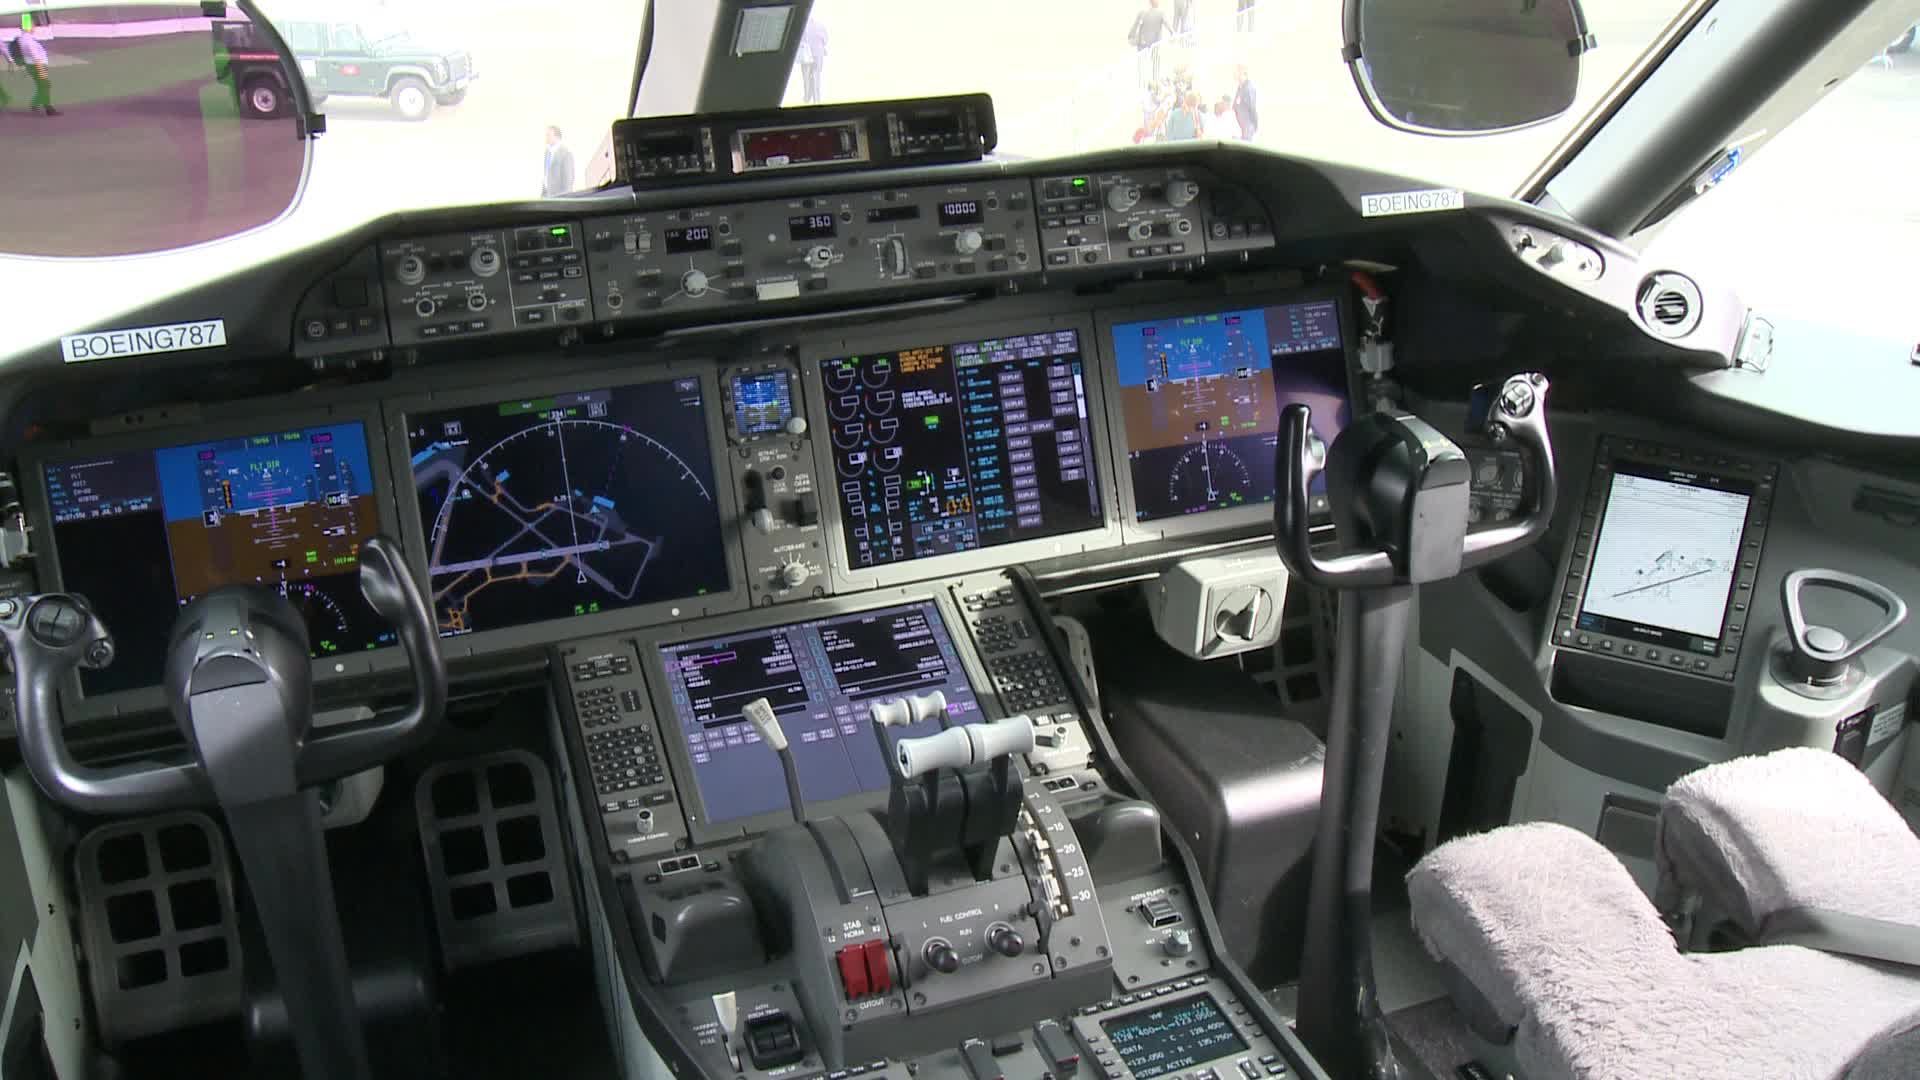 Boeing 787 Cockpit Video Clip 12281817 Pond5